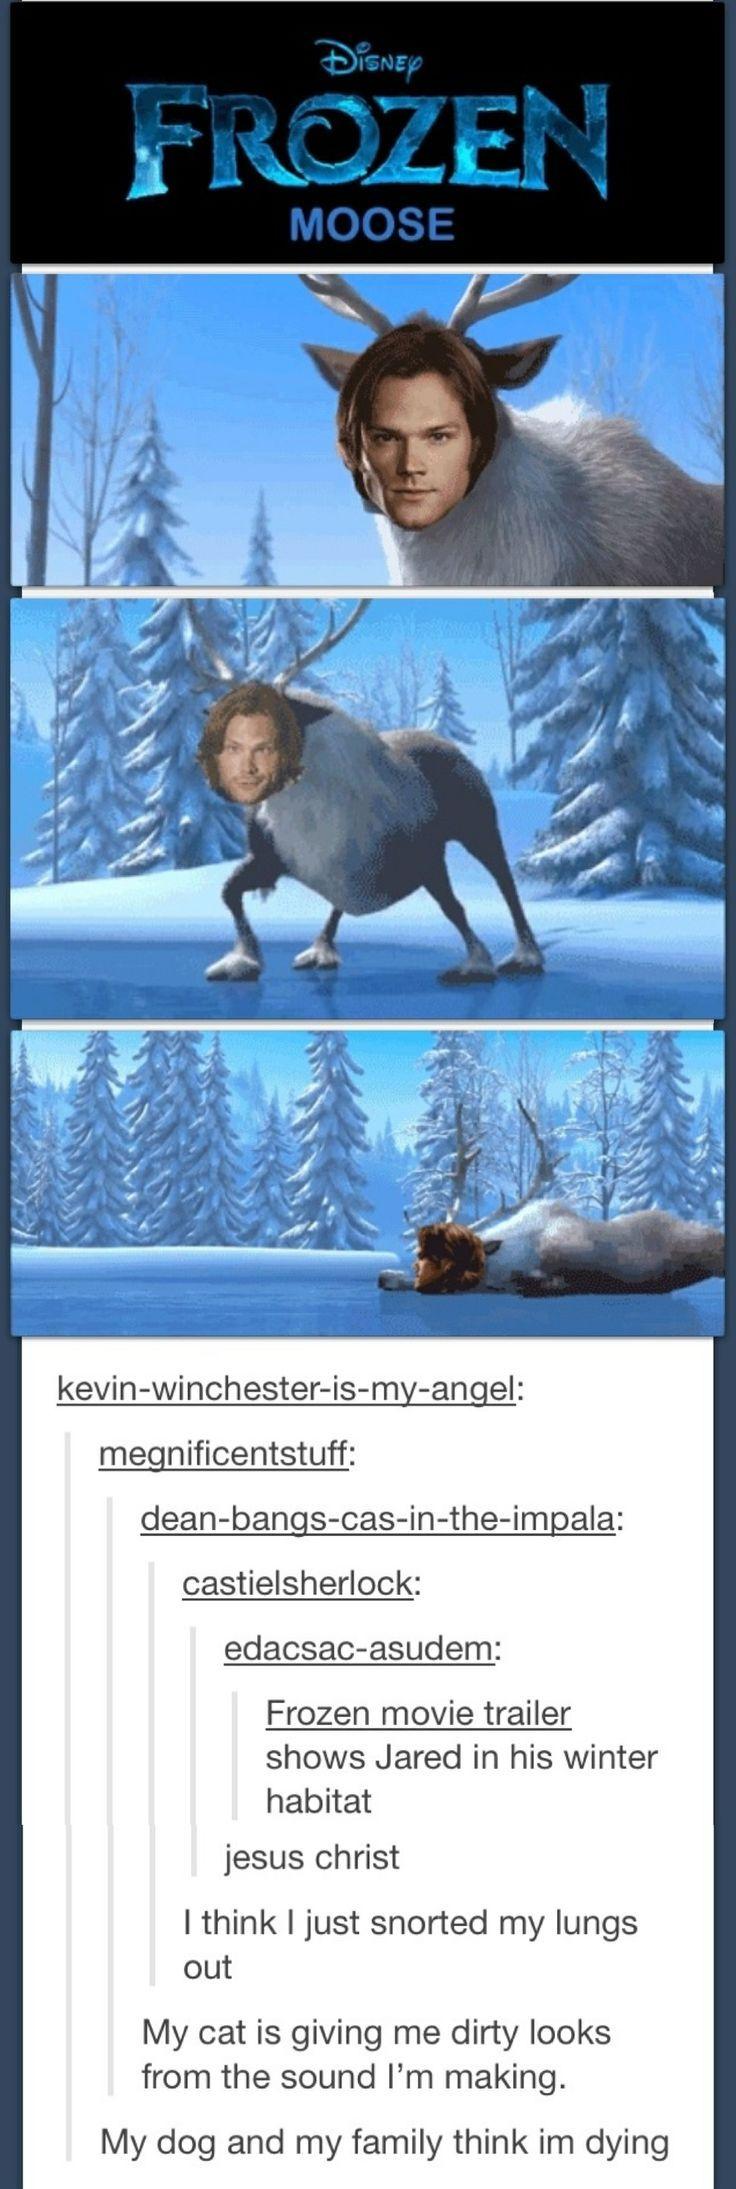 Supernatural Frozen moose. Sam in his winter habitat.